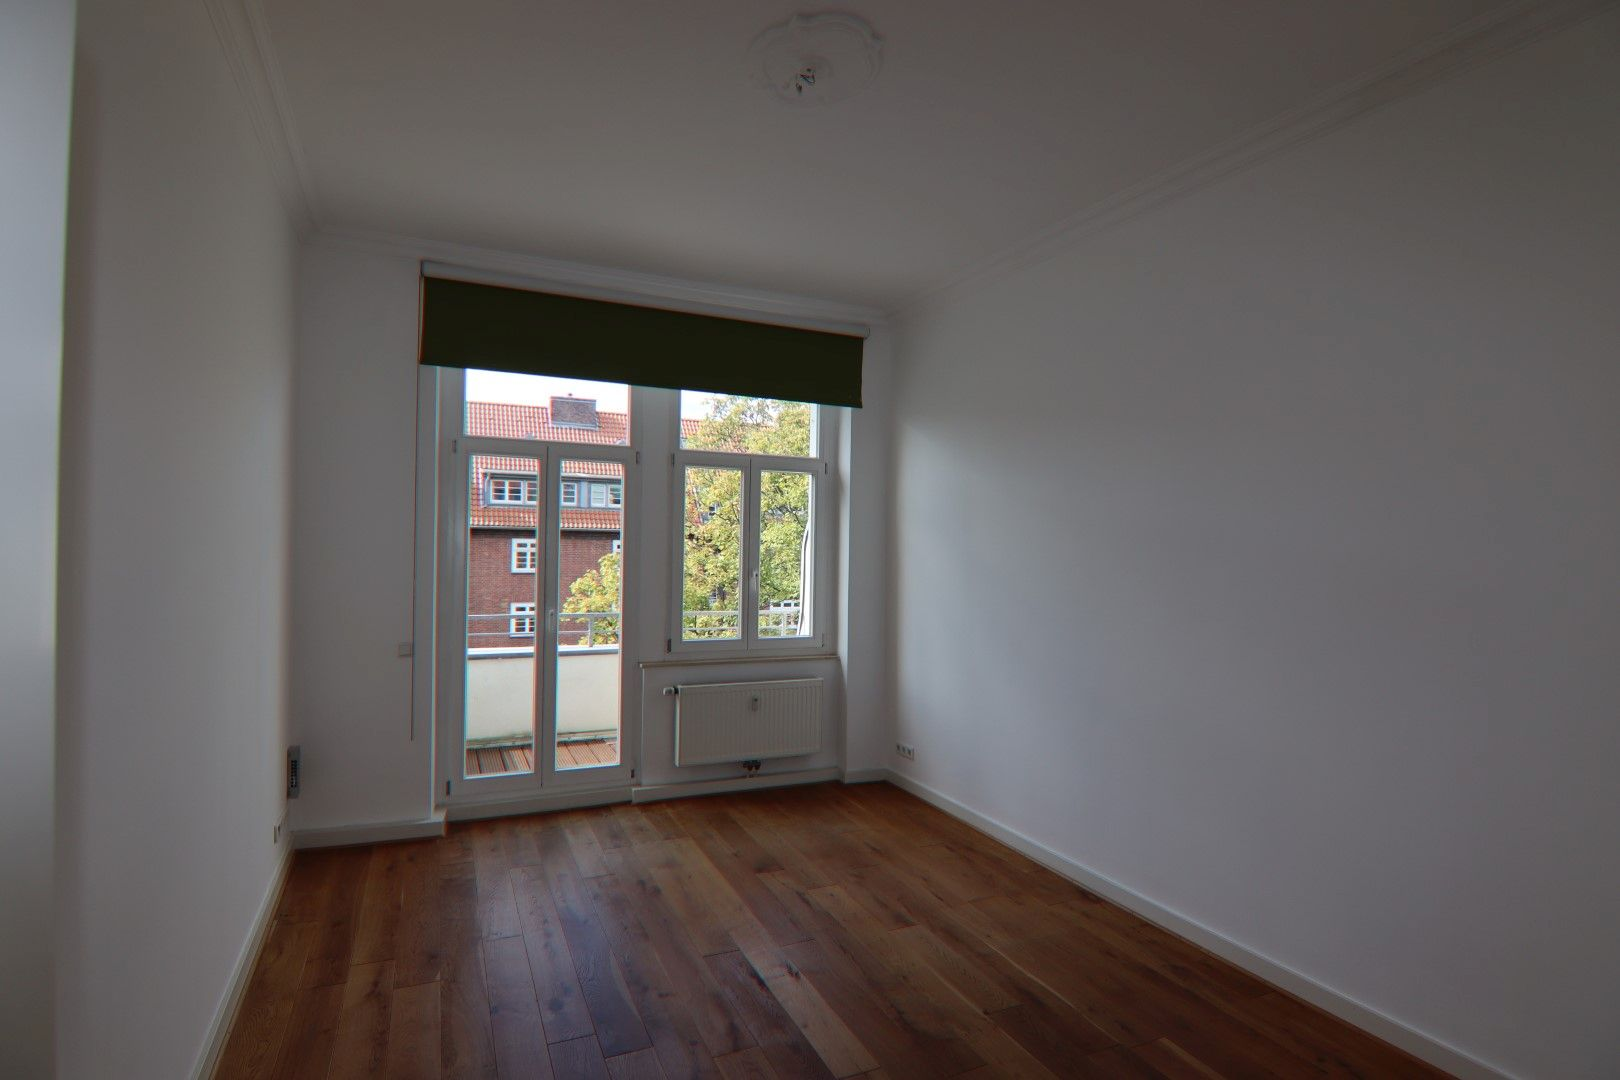 Immobilie Nr.0271 - 3-Zimmer-Altbauwohnung mit Aufzug im 3.OG - Bild 13.jpg